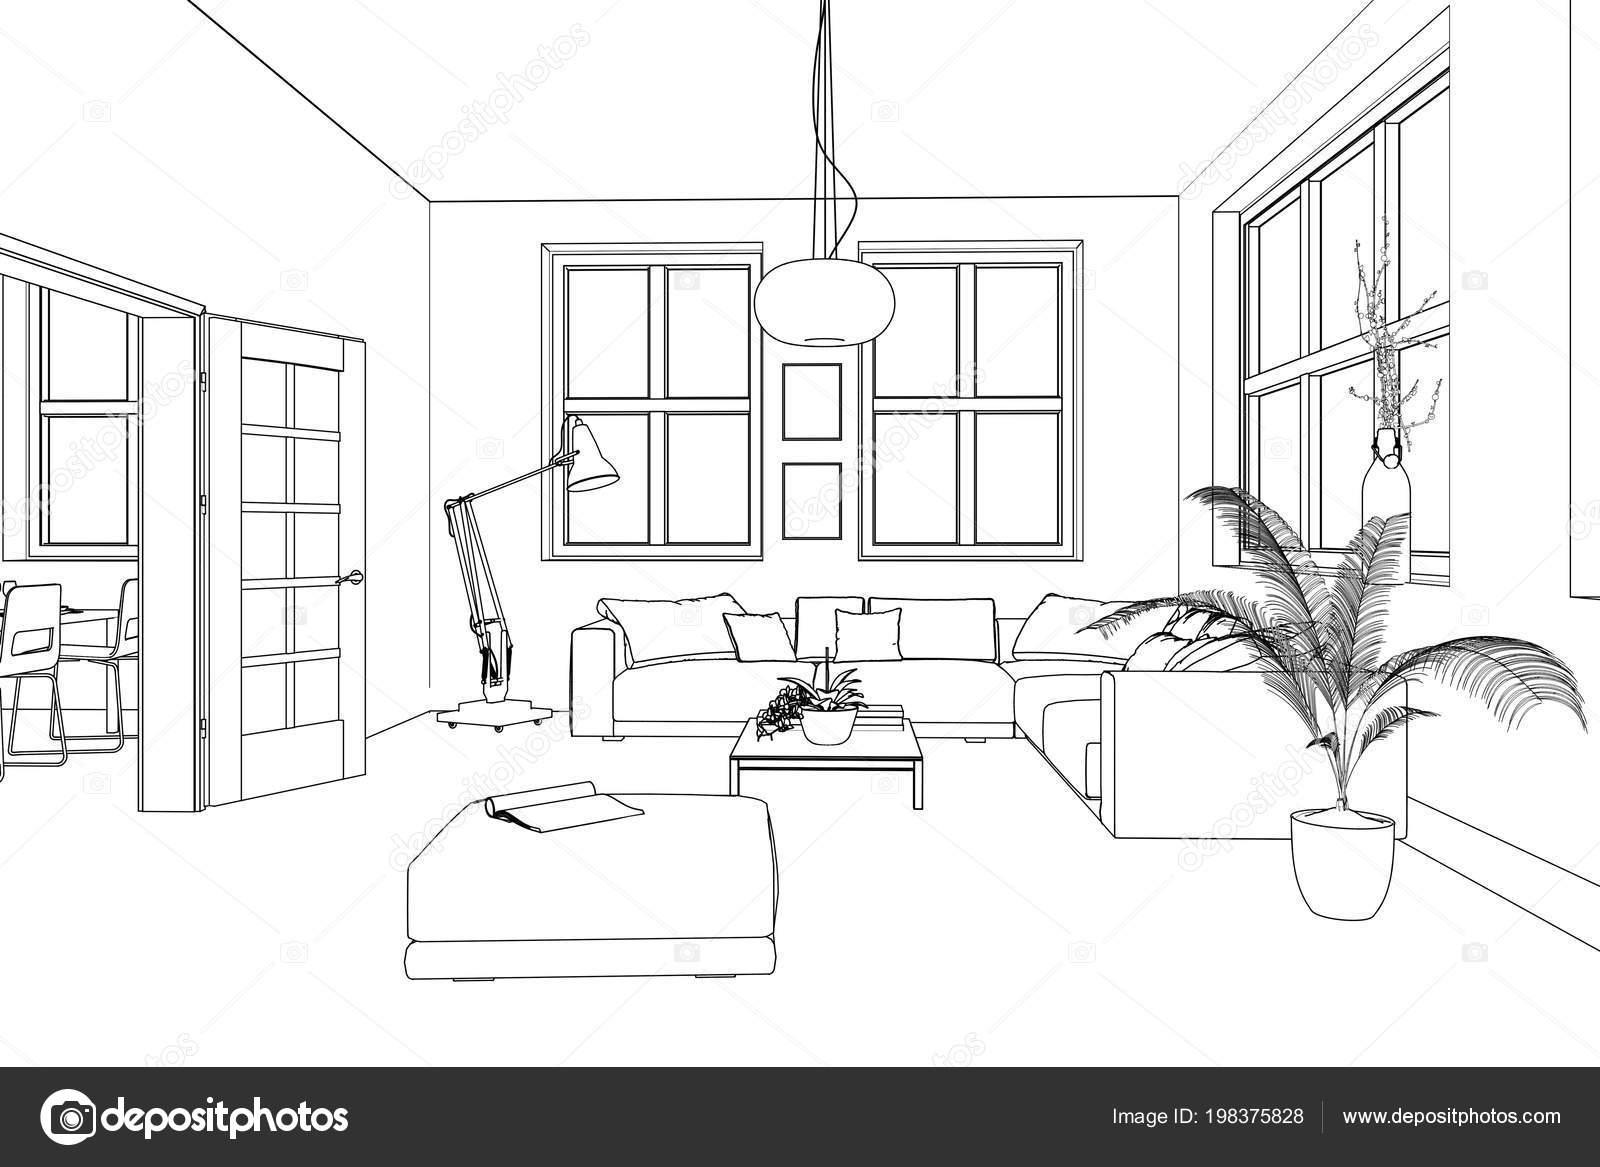 Dibujo personalizado de dise o de interiores living for Imagenes de diseno de interiores